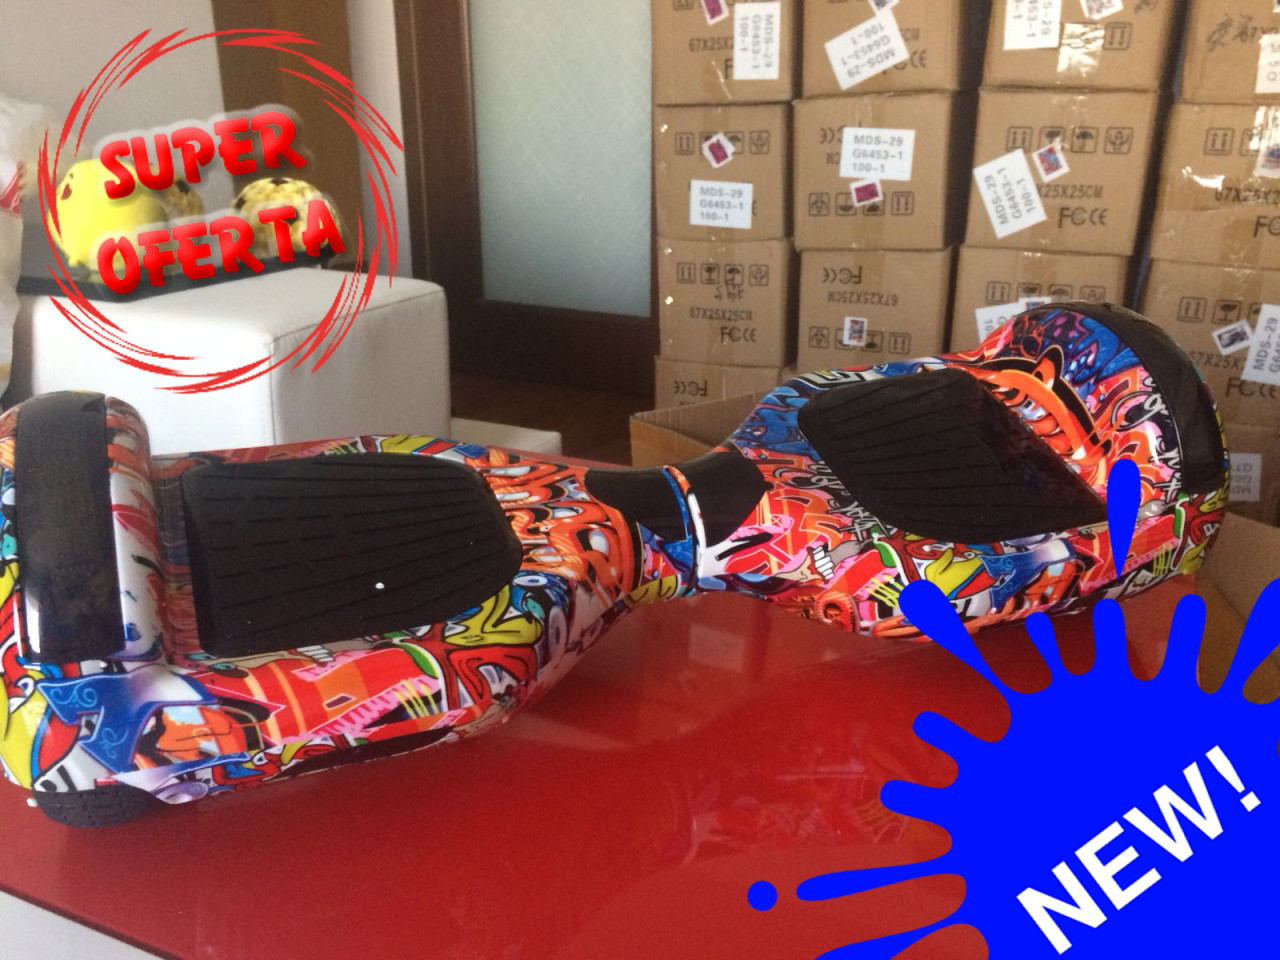 Hoverboard Bluetooth + Leduri (Garantie 12luni in RO)-OFERTA VERII